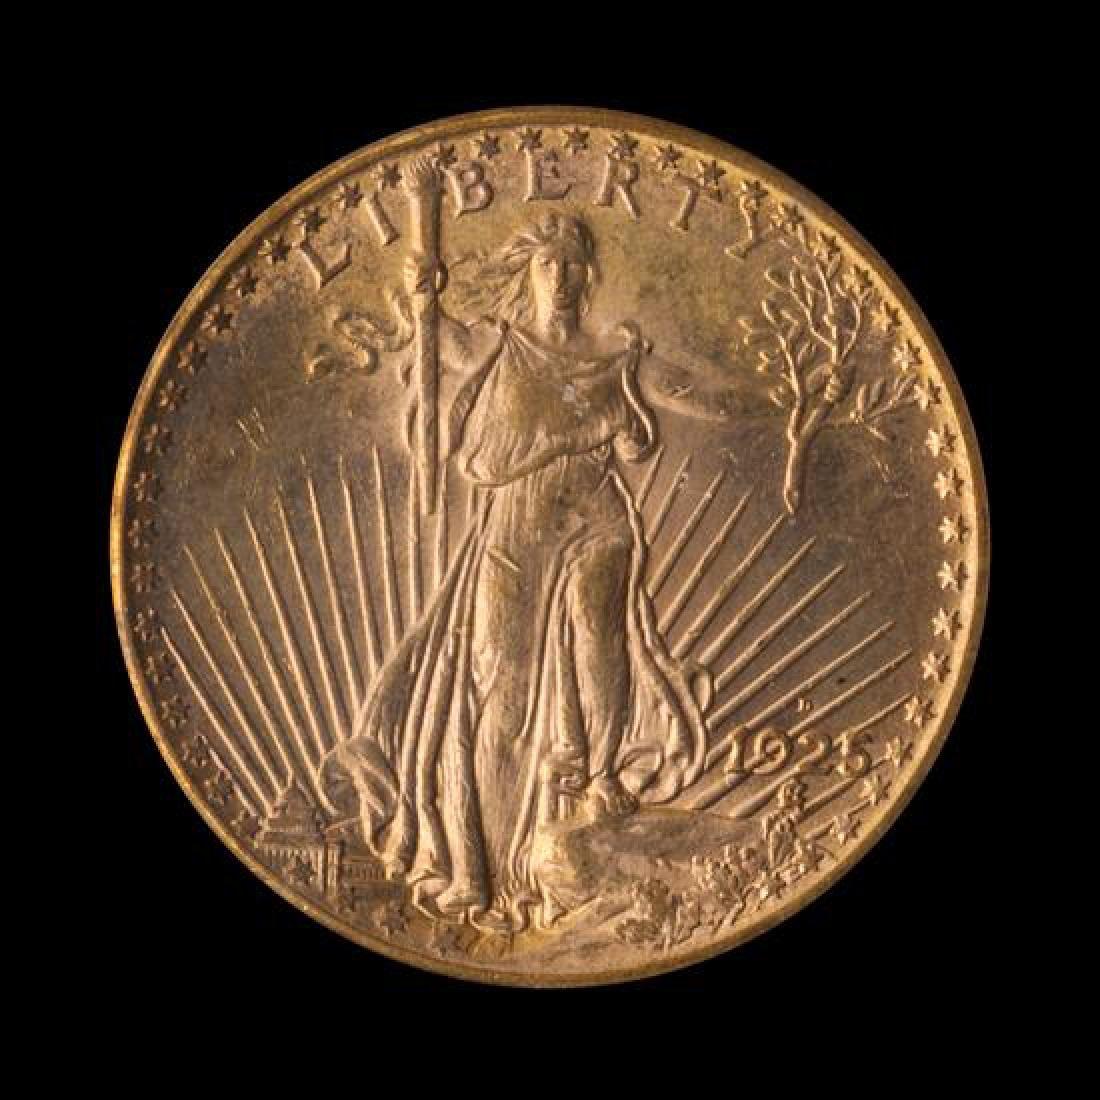 A United States 1925-D Saint-Gaudens $20 Gold Coin